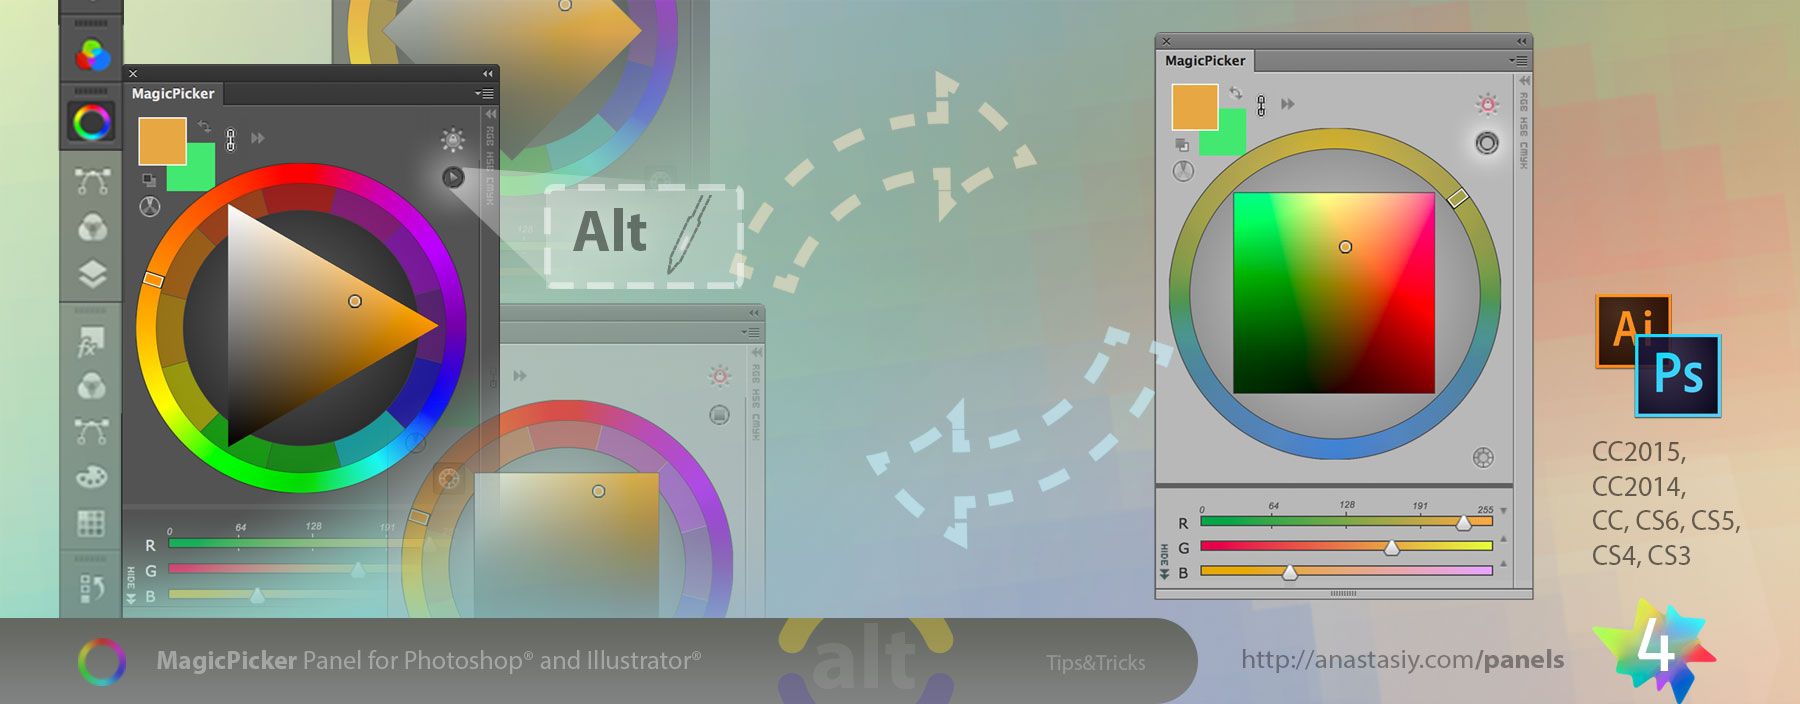 Quickly adjust color temperature with MagicPicker